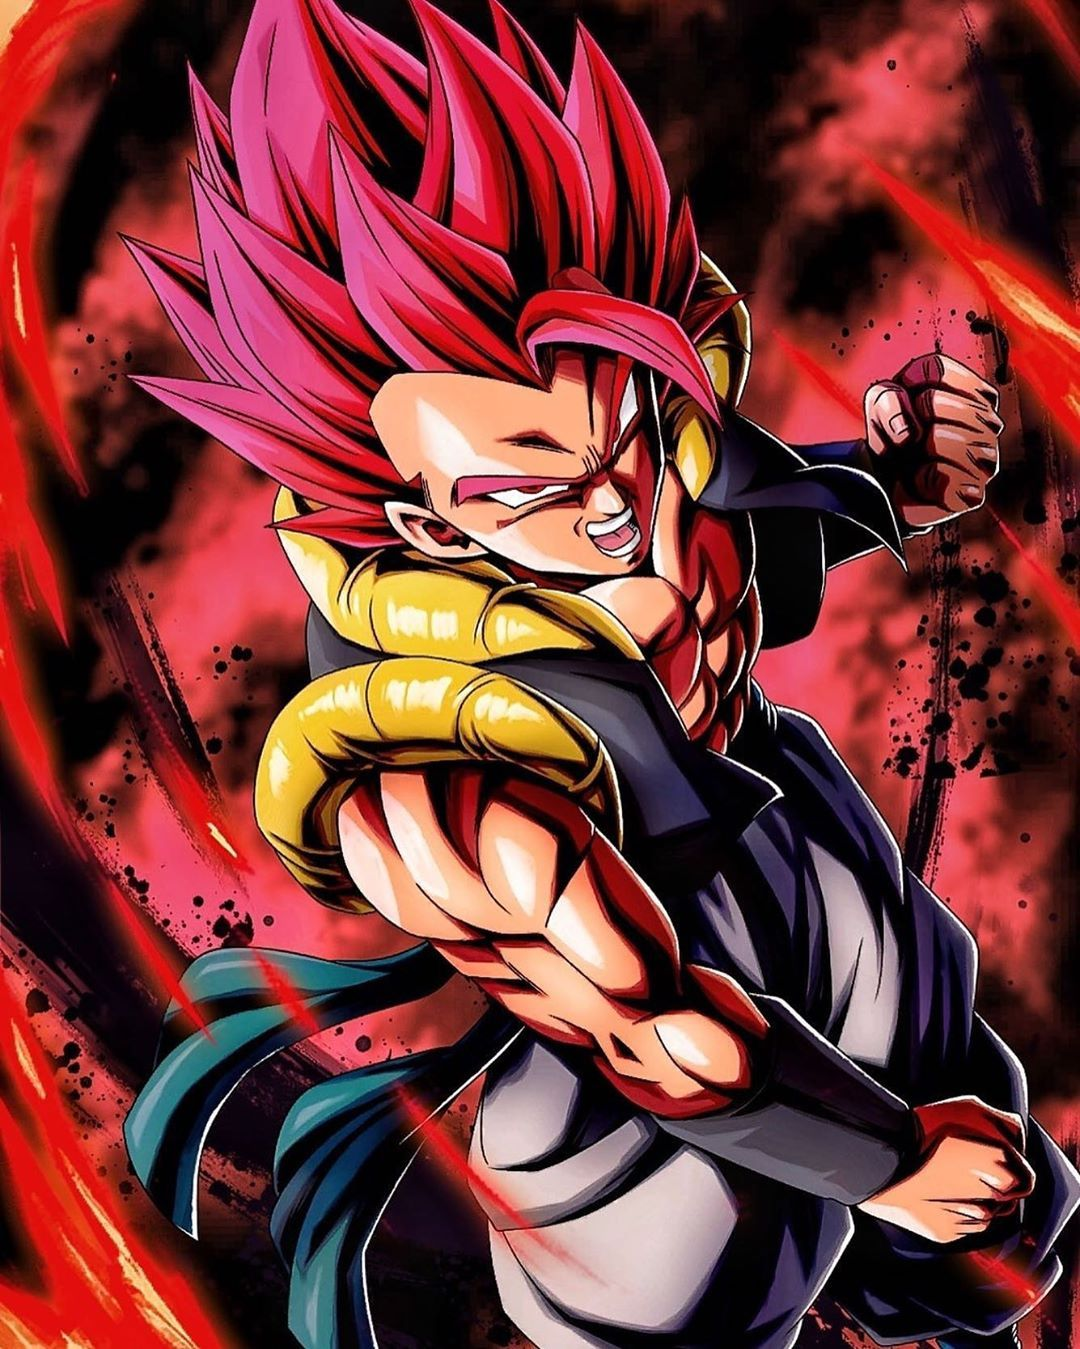 Super Saiyan God Gogeta Follow Official Gogeta Blue For More Dragon Ball E Anime Dragon Ball Super Dragon Ball Super Manga Dragon Ball Super Wallpapers